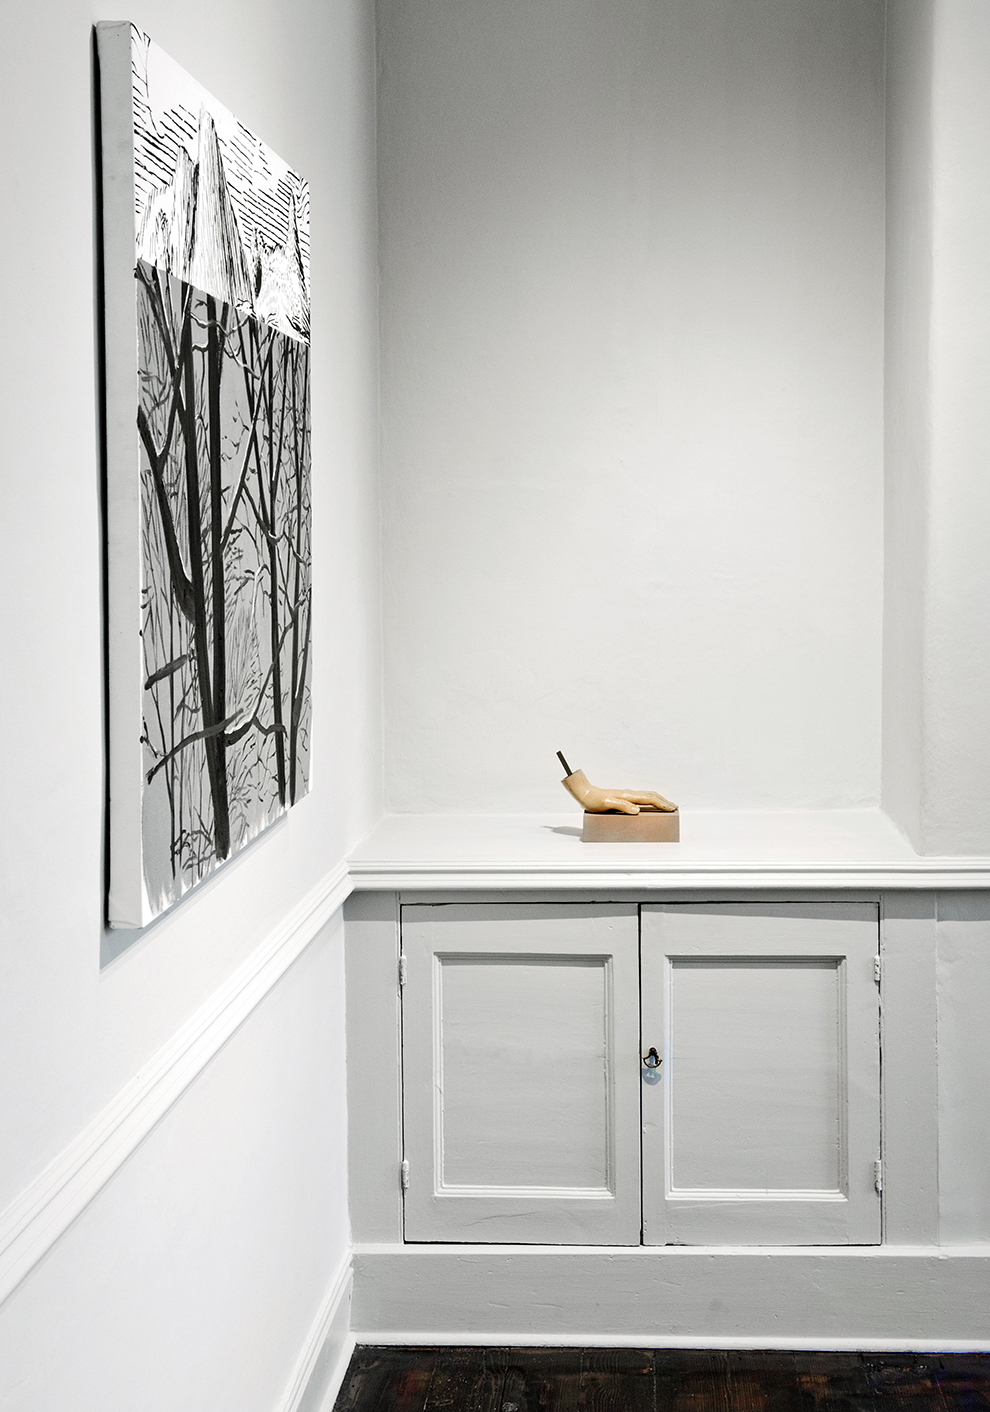 Installation view -Dexter Dalwood, John Stezaker